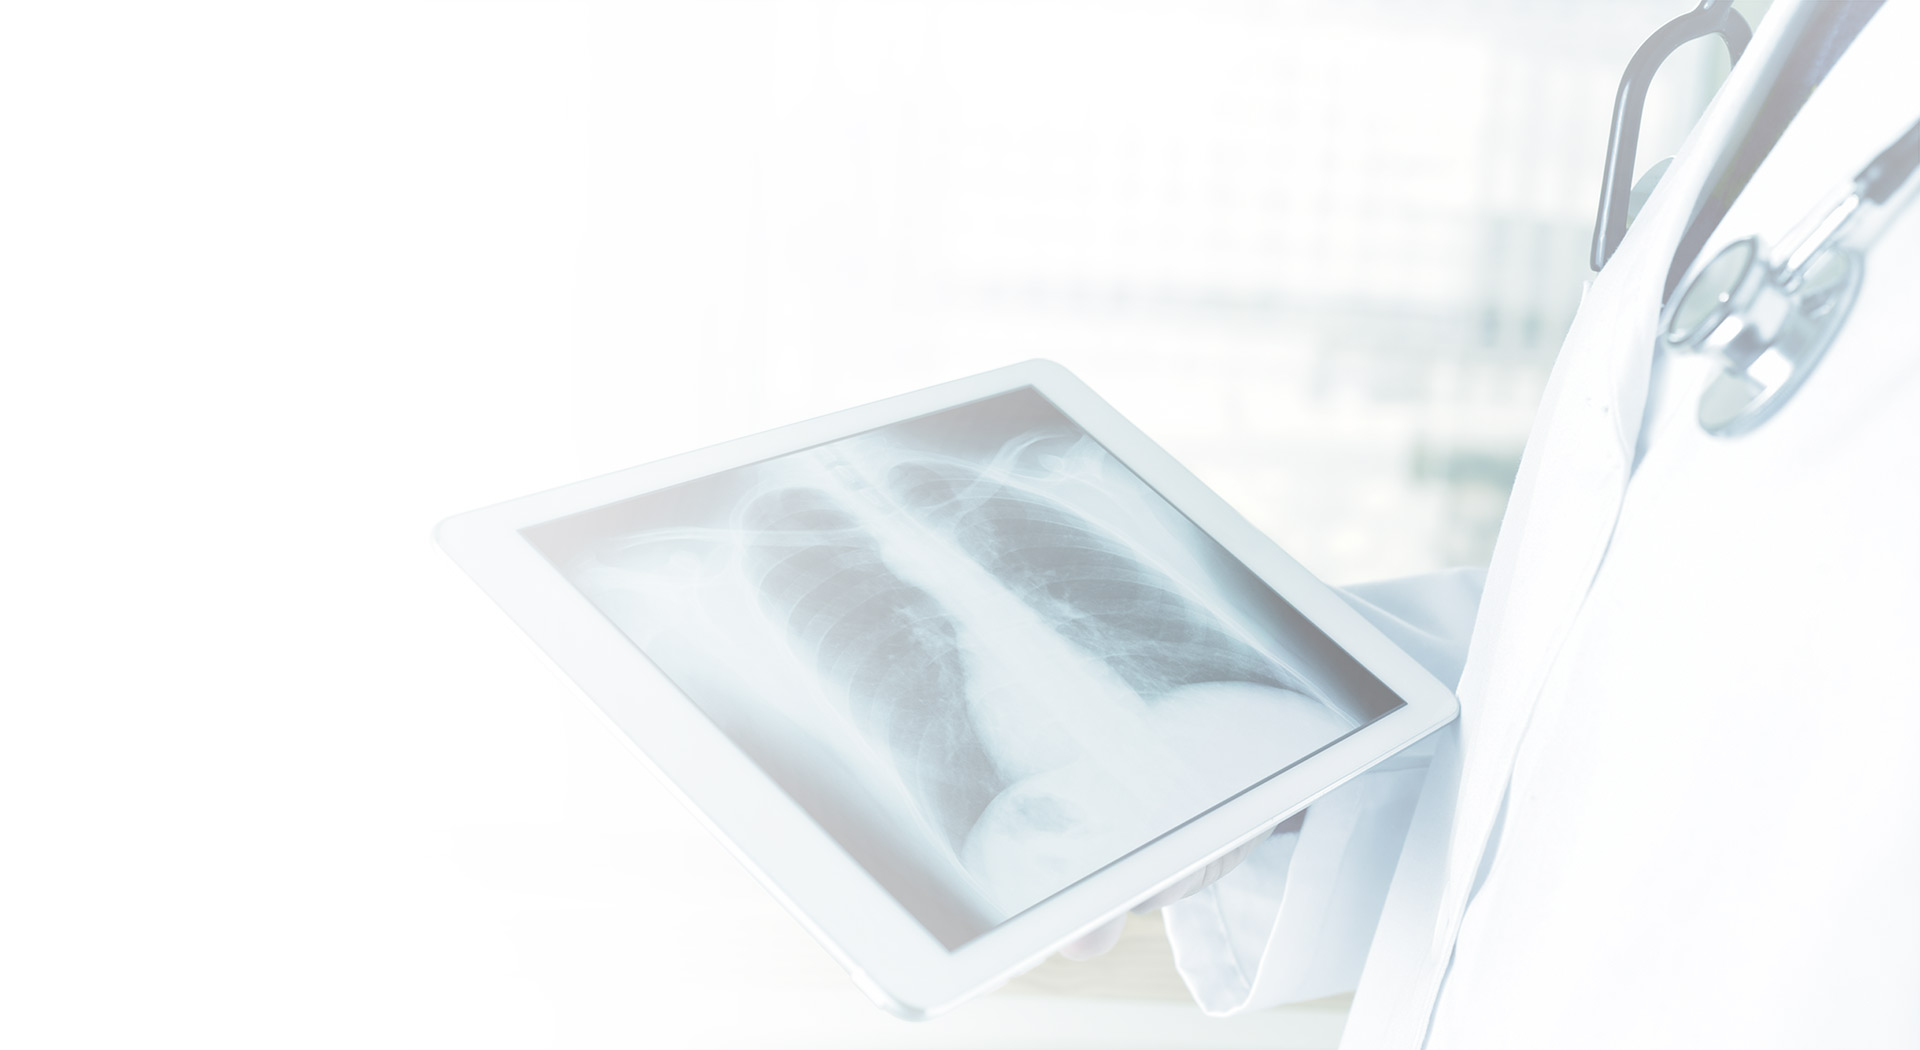 The case Fürstenfeldbruck shows still high risk potential in health care sector